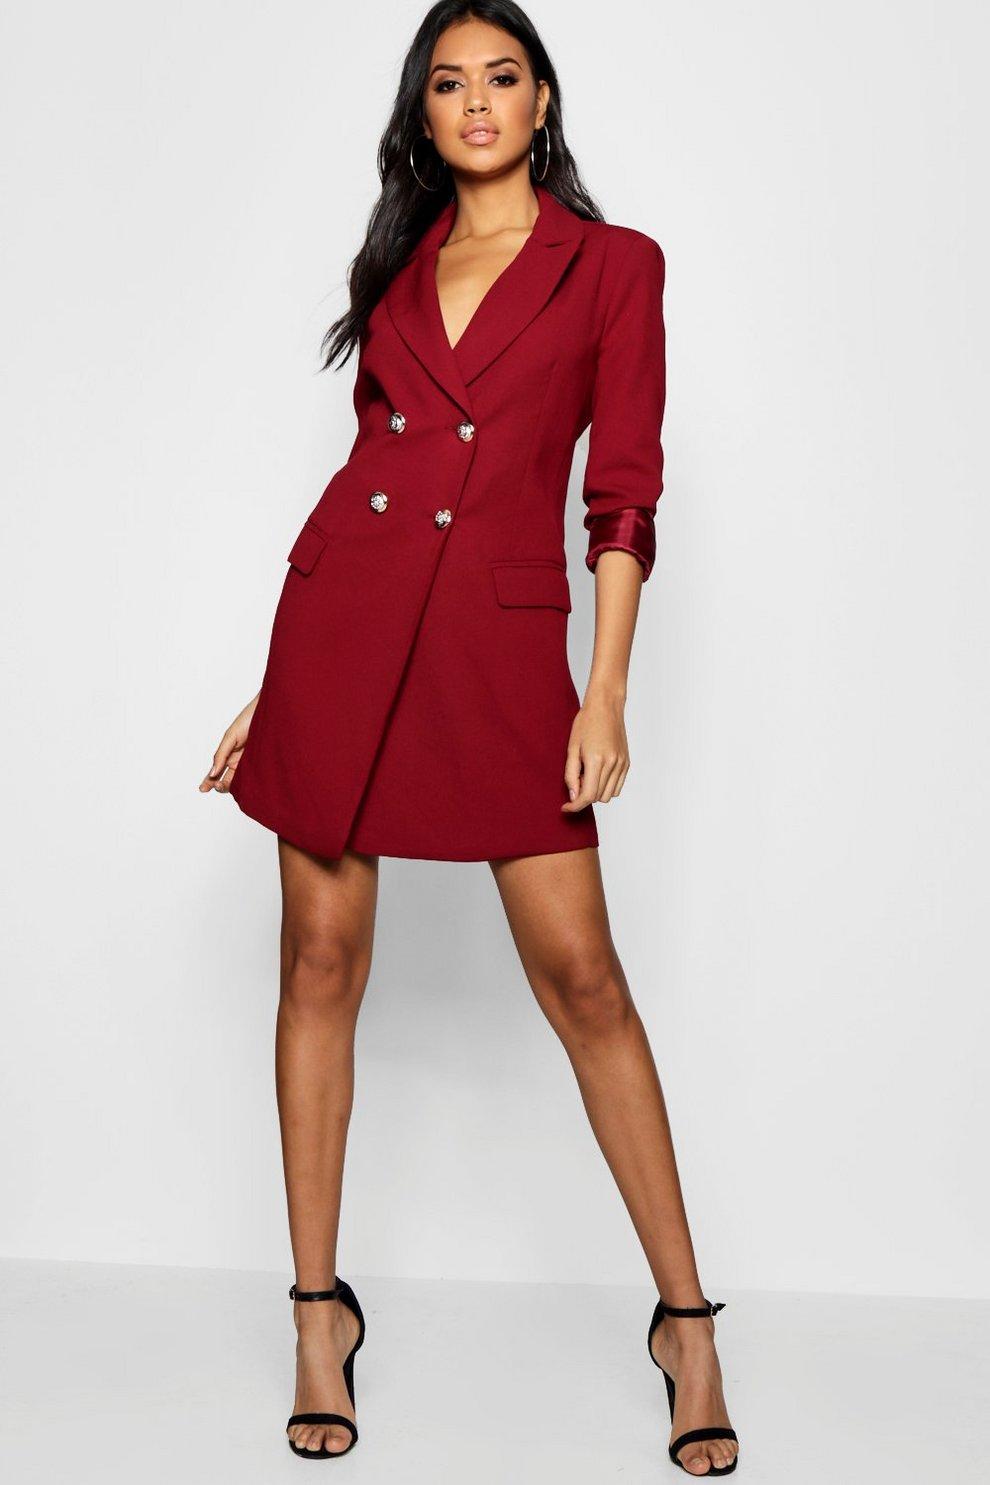 1679e209e776 Double Breasted Tailored Blazer Dress | Boohoo